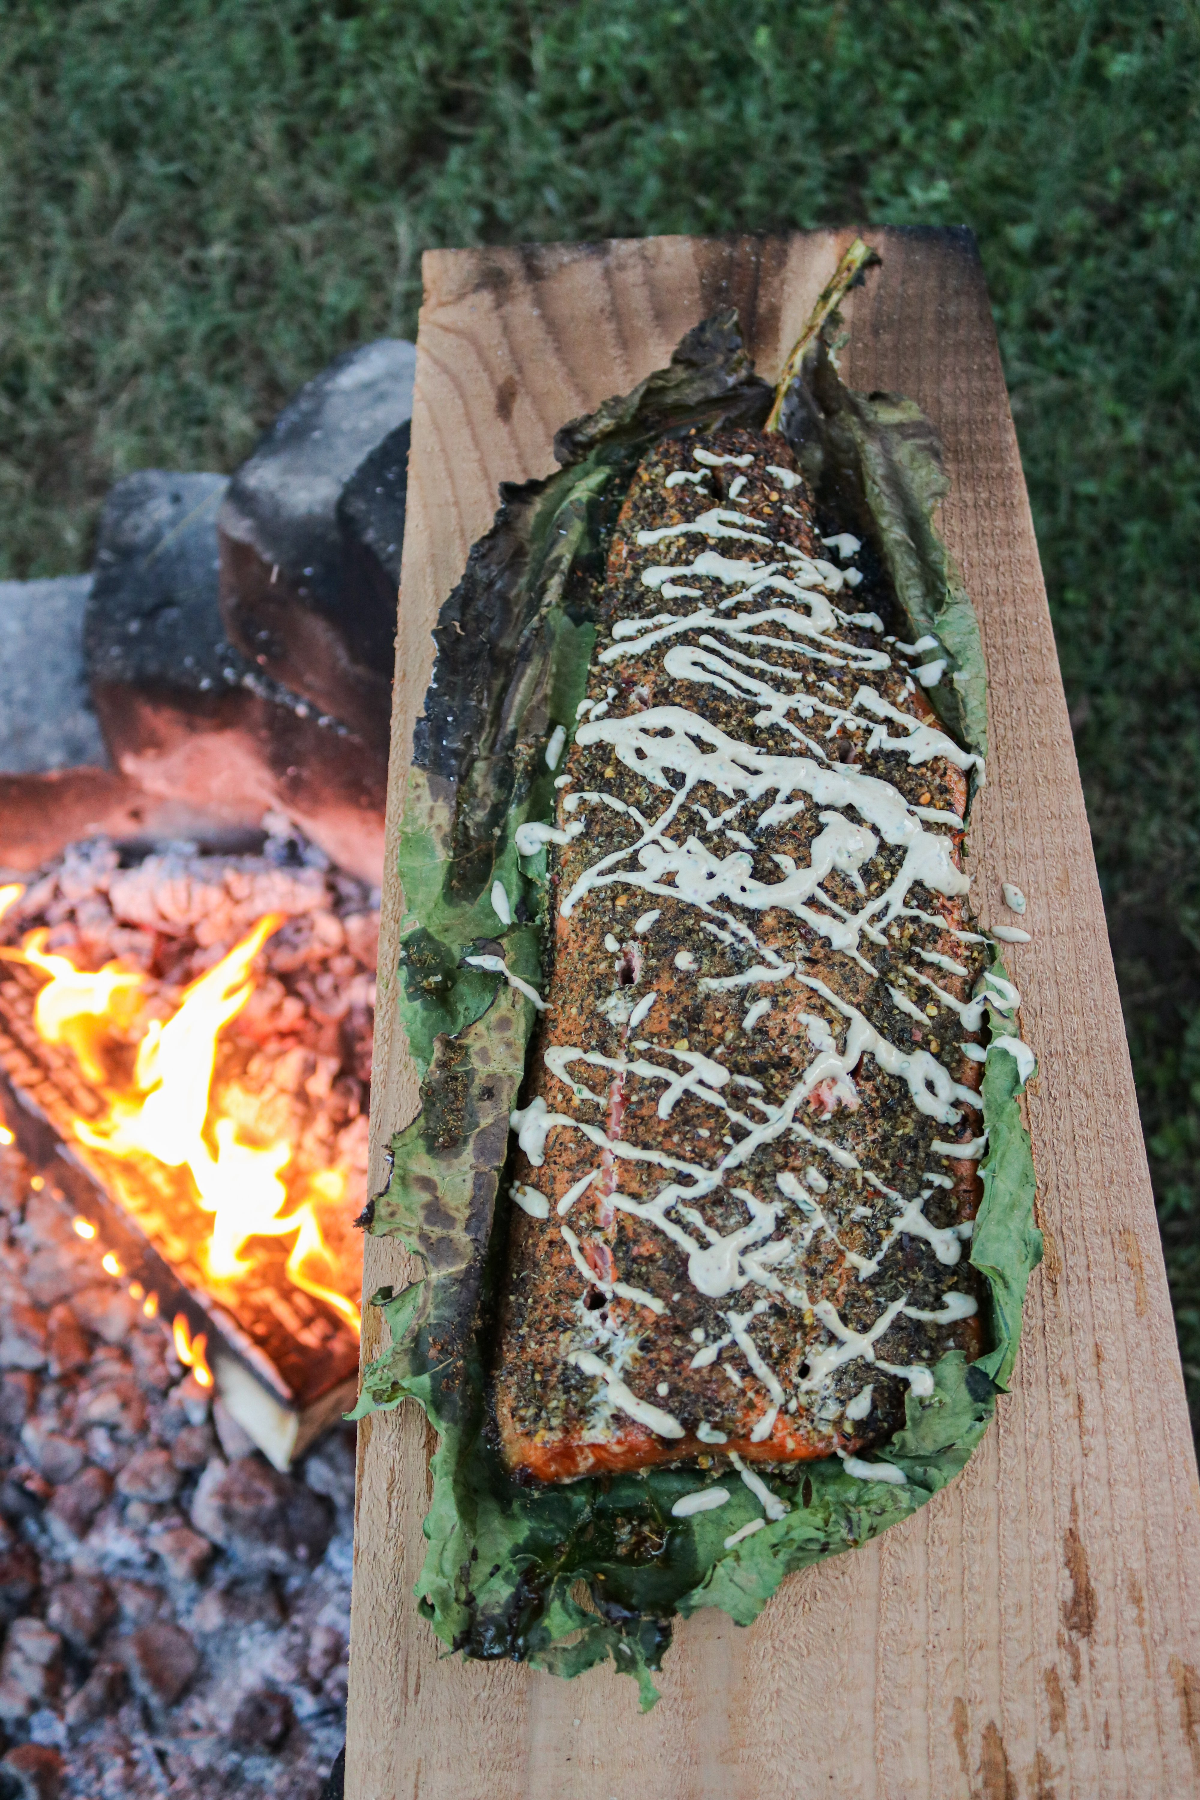 leaning salmon with roasted garlic aioli